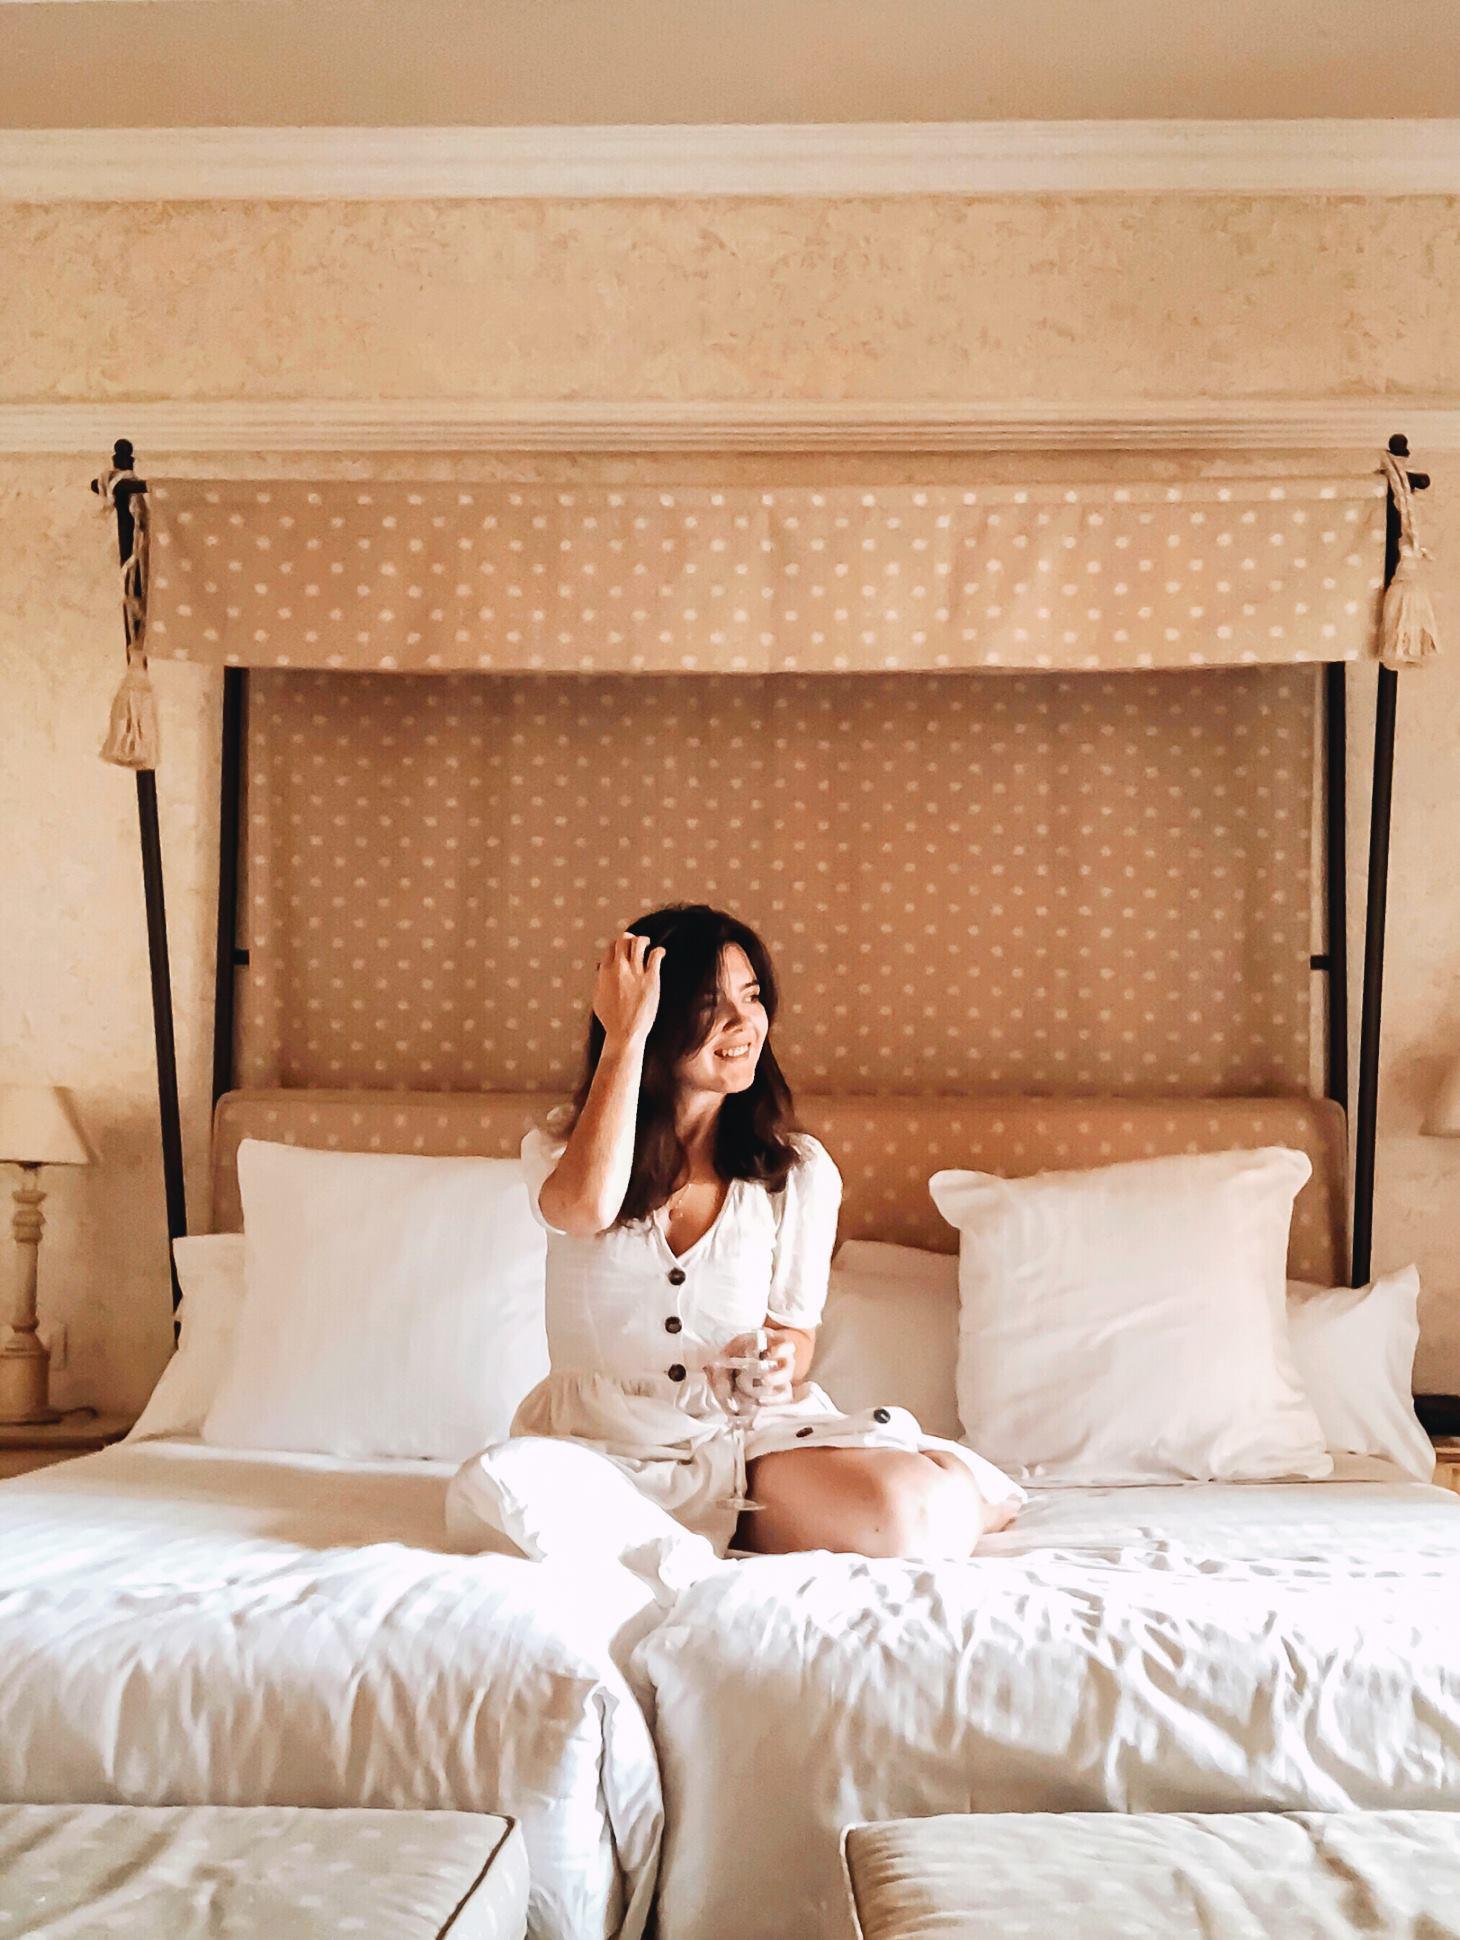 Benidorm Hotel Bedroom.jpg